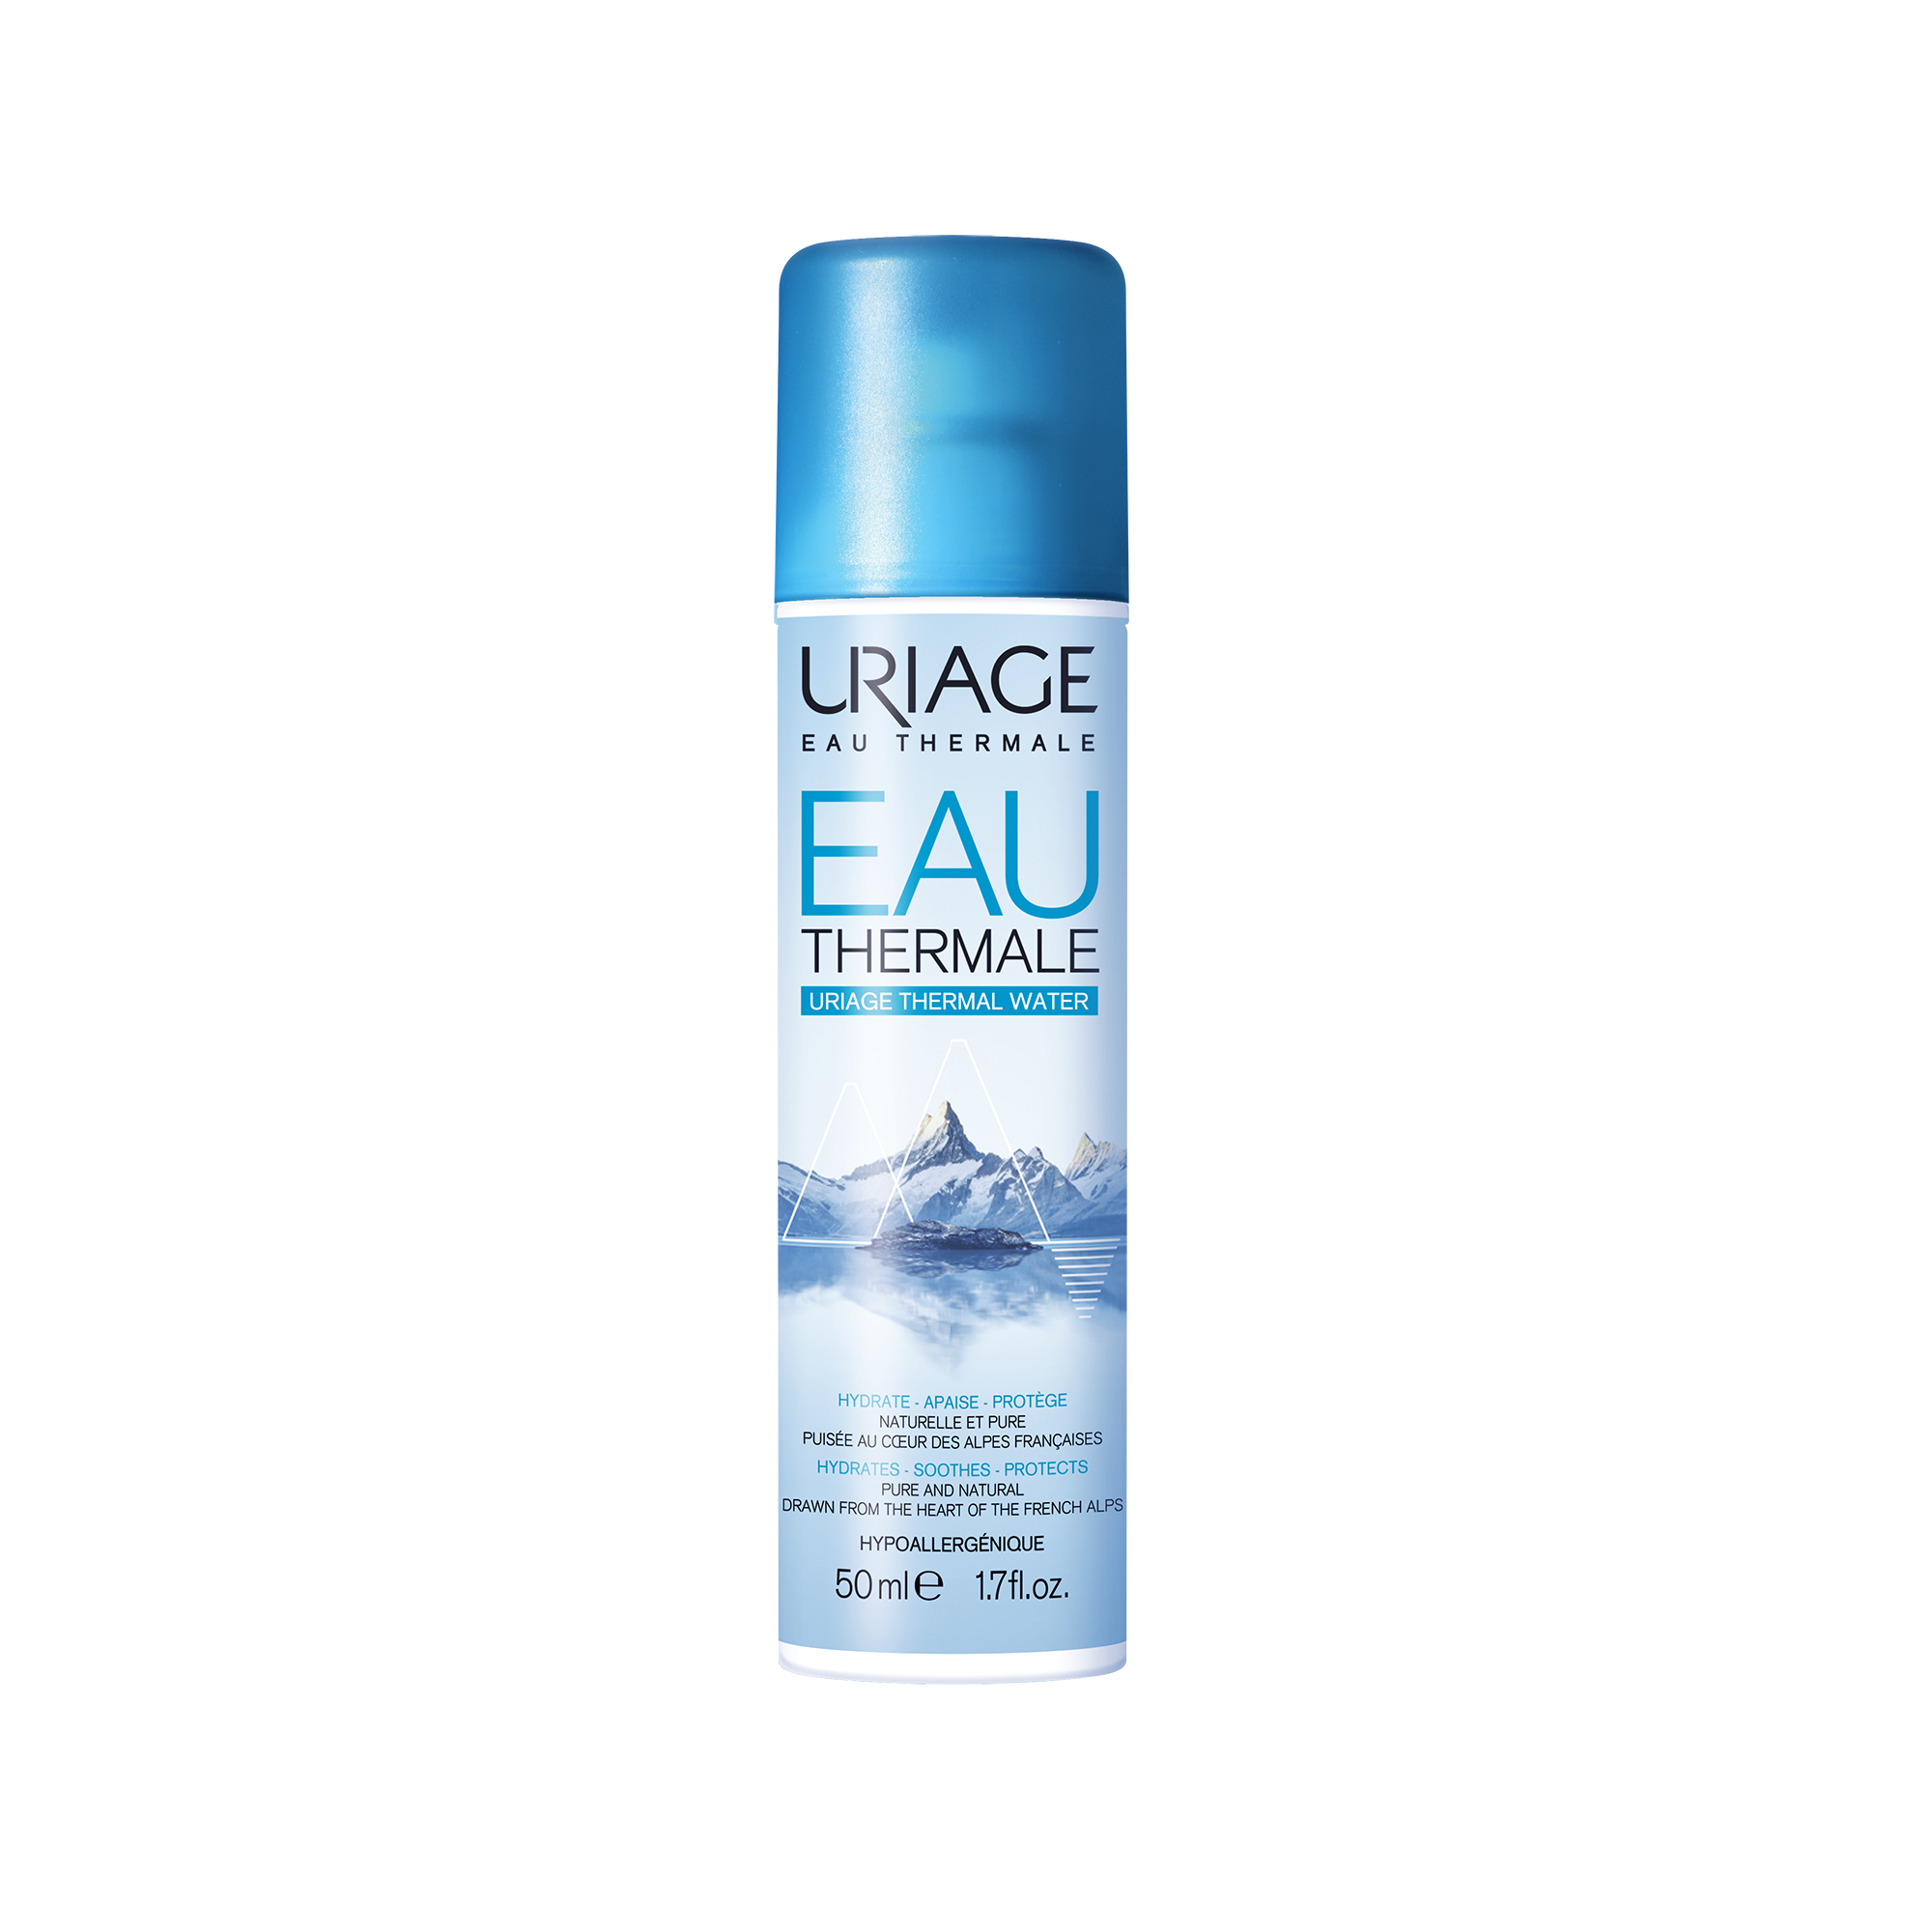 Uriage Eau Thermal Water Νερό Περιποίησης για Καθημερινή Χρήση 50ml